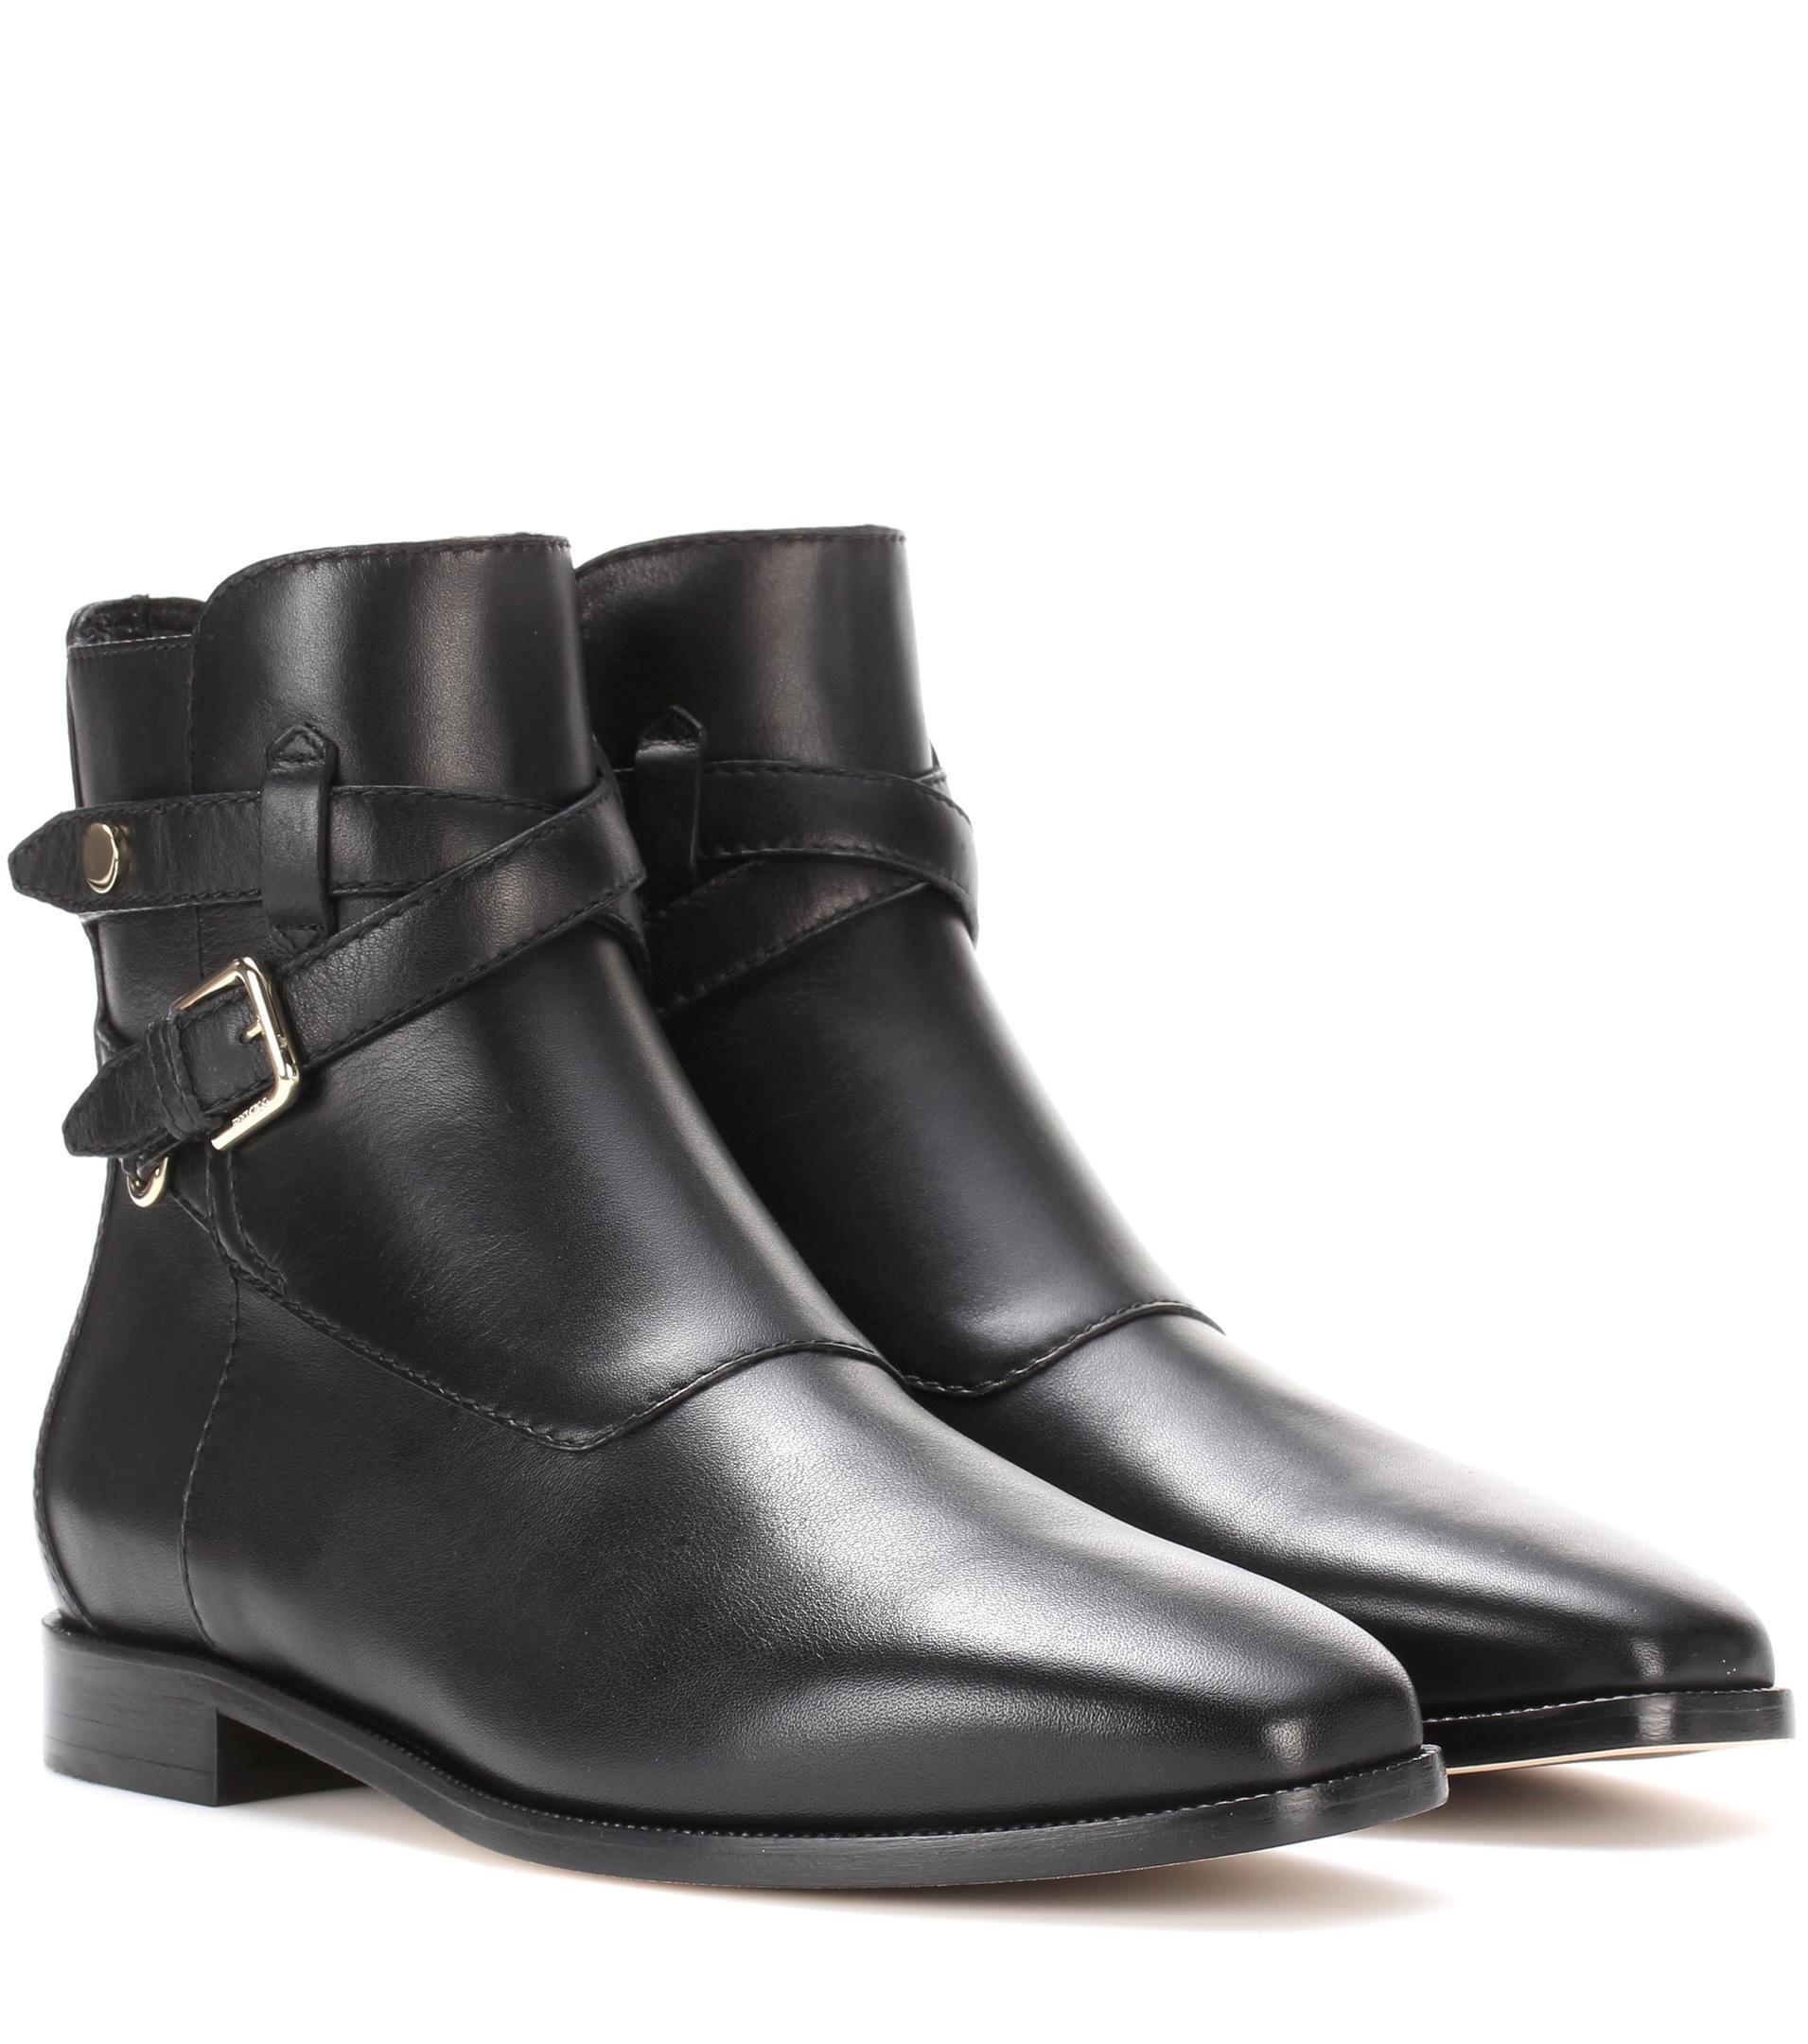 4d7dafdd470b ... promo code jimmy choo mitchel leather ankle boots in black lyst 0a157  1b9af ...